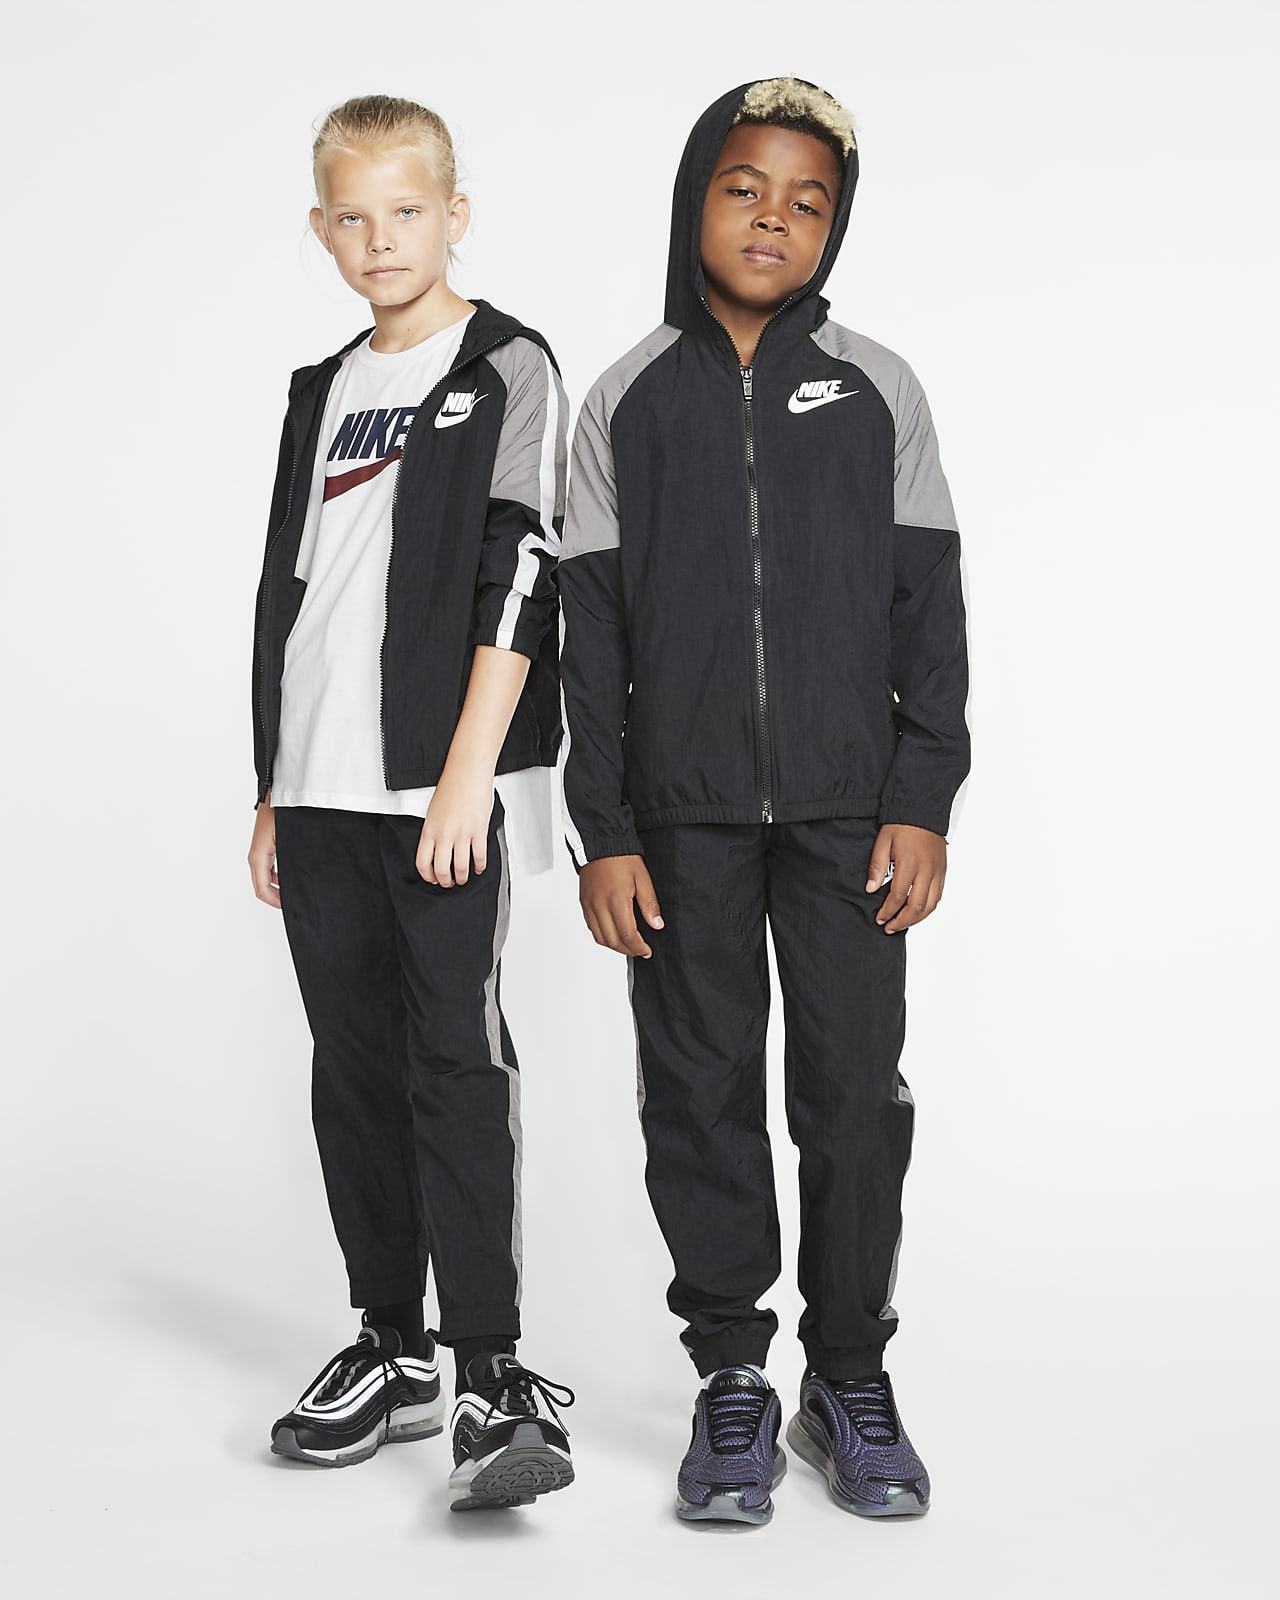 diamante Y equipo Empeorando  Nike Sportswear Older Kids' Woven Tracksuit. Nike GB